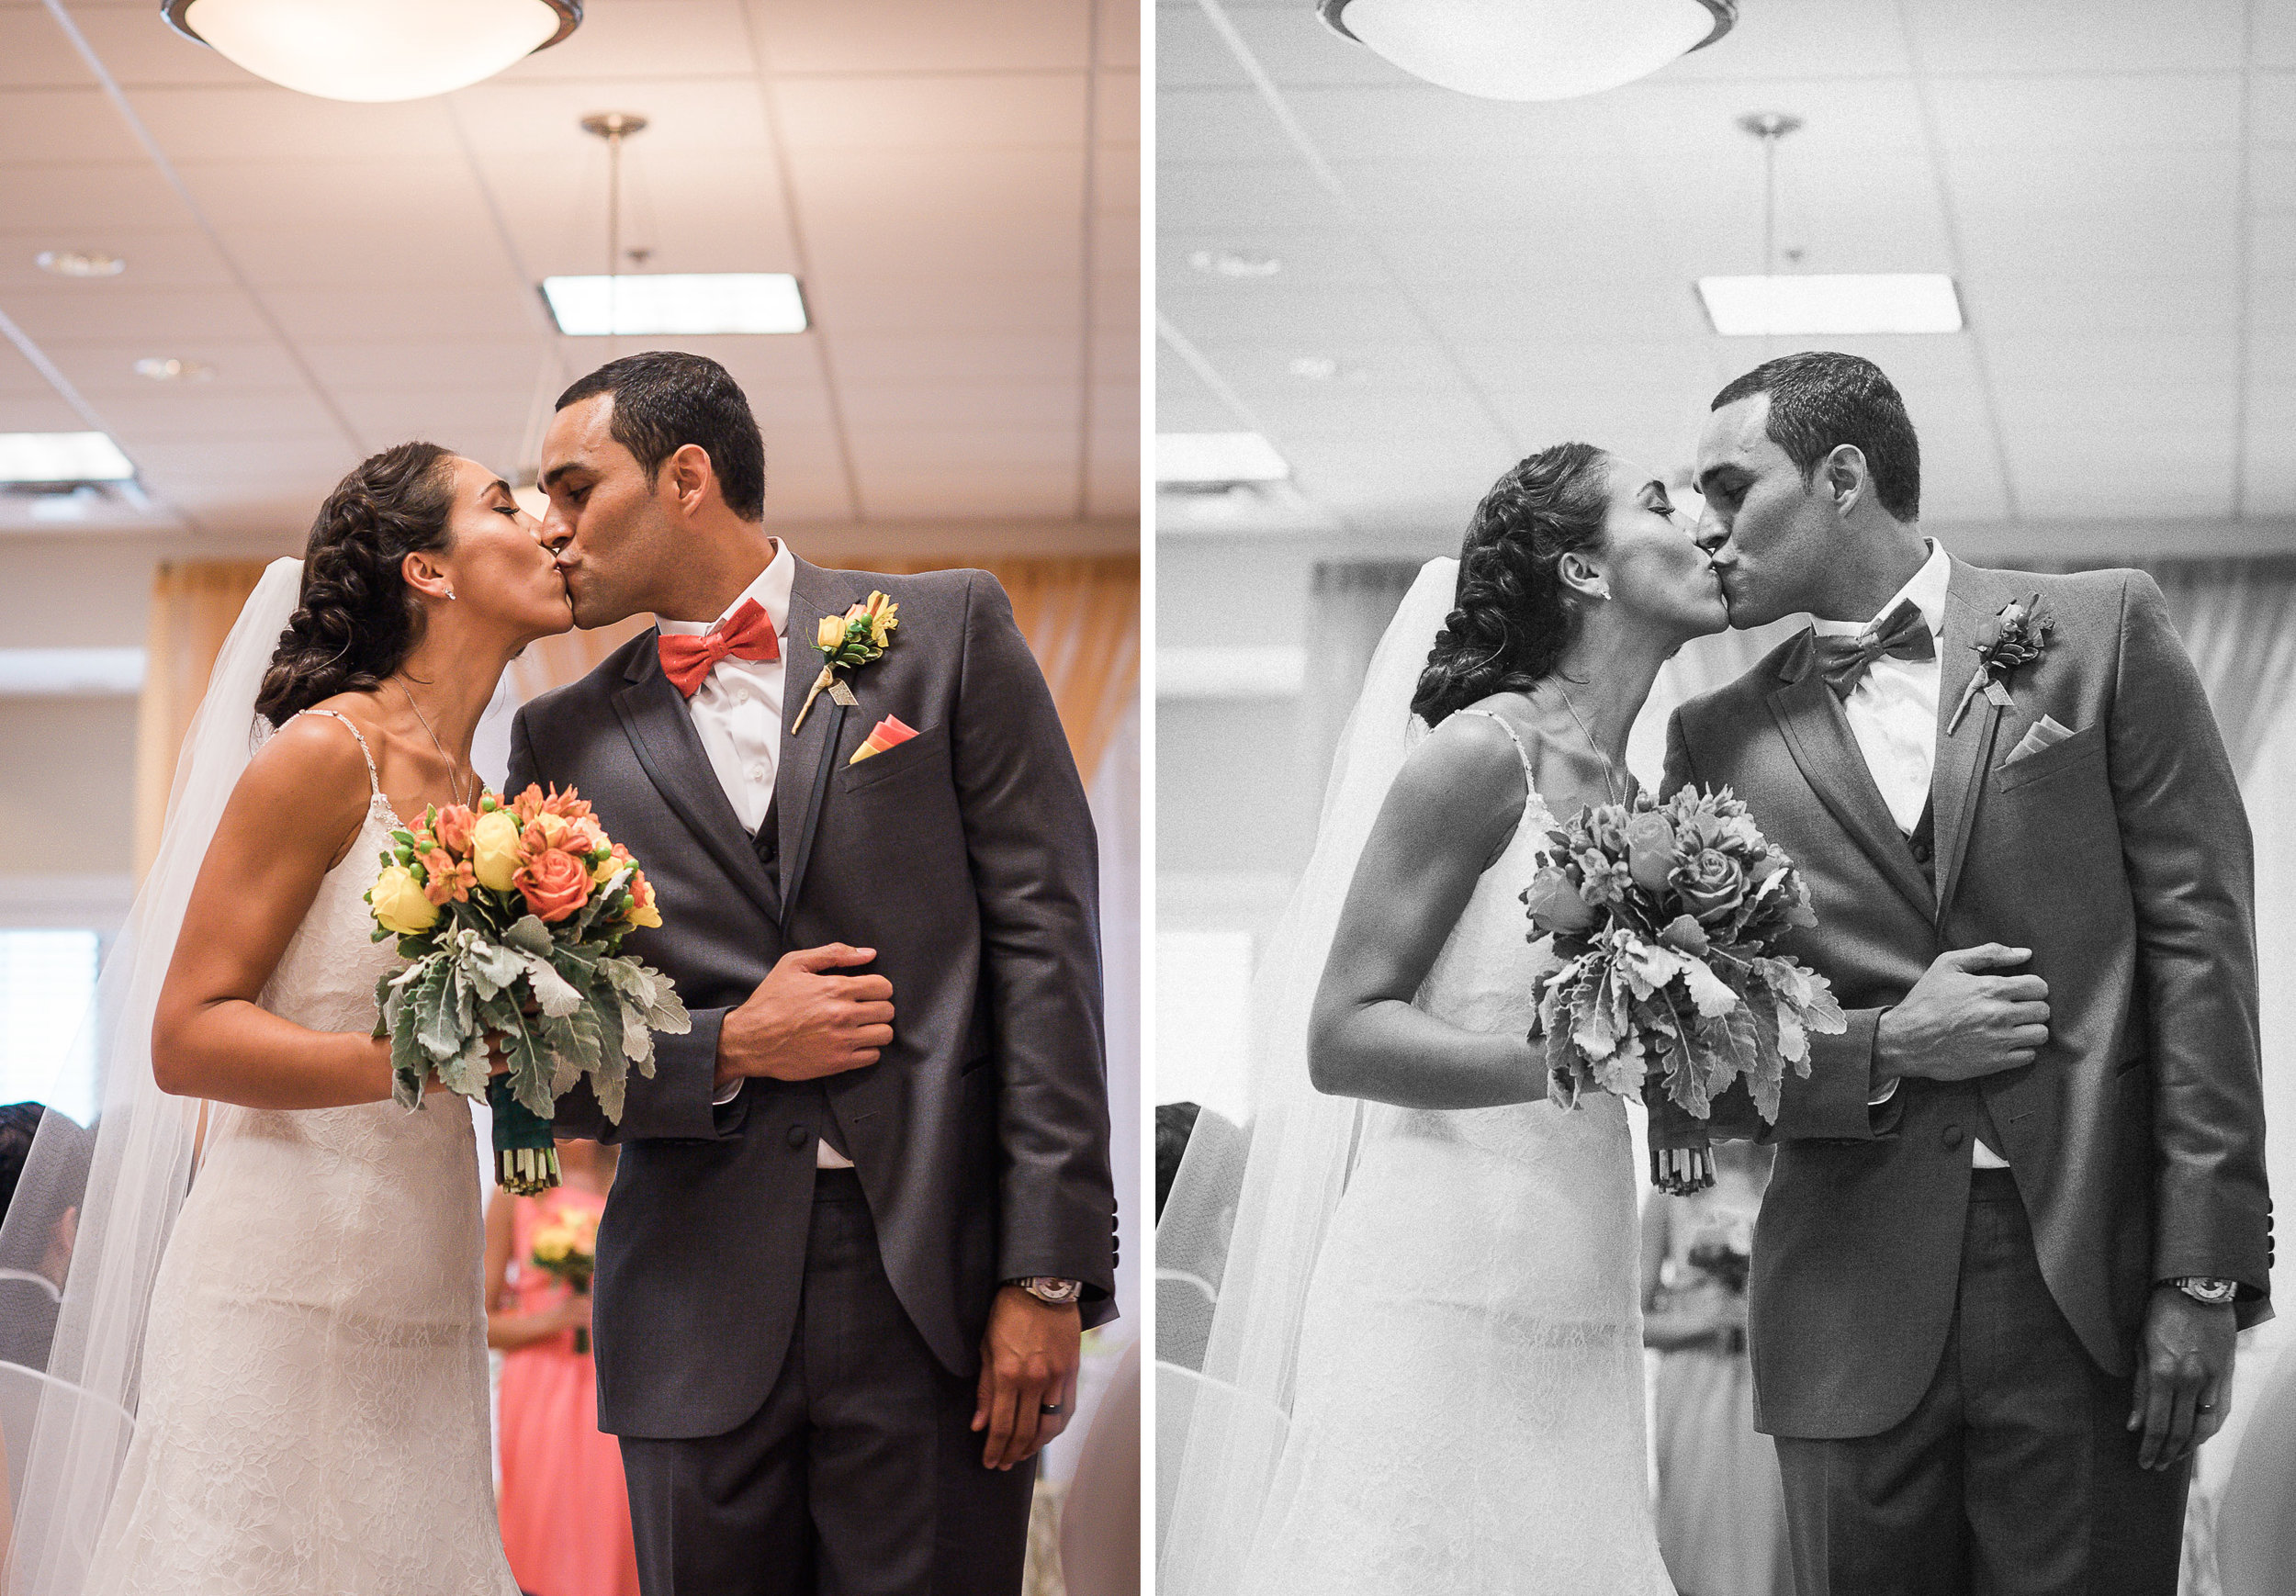 KateTaramykinStudios-Kissimmee-Wedding-Arzola-12.jpg